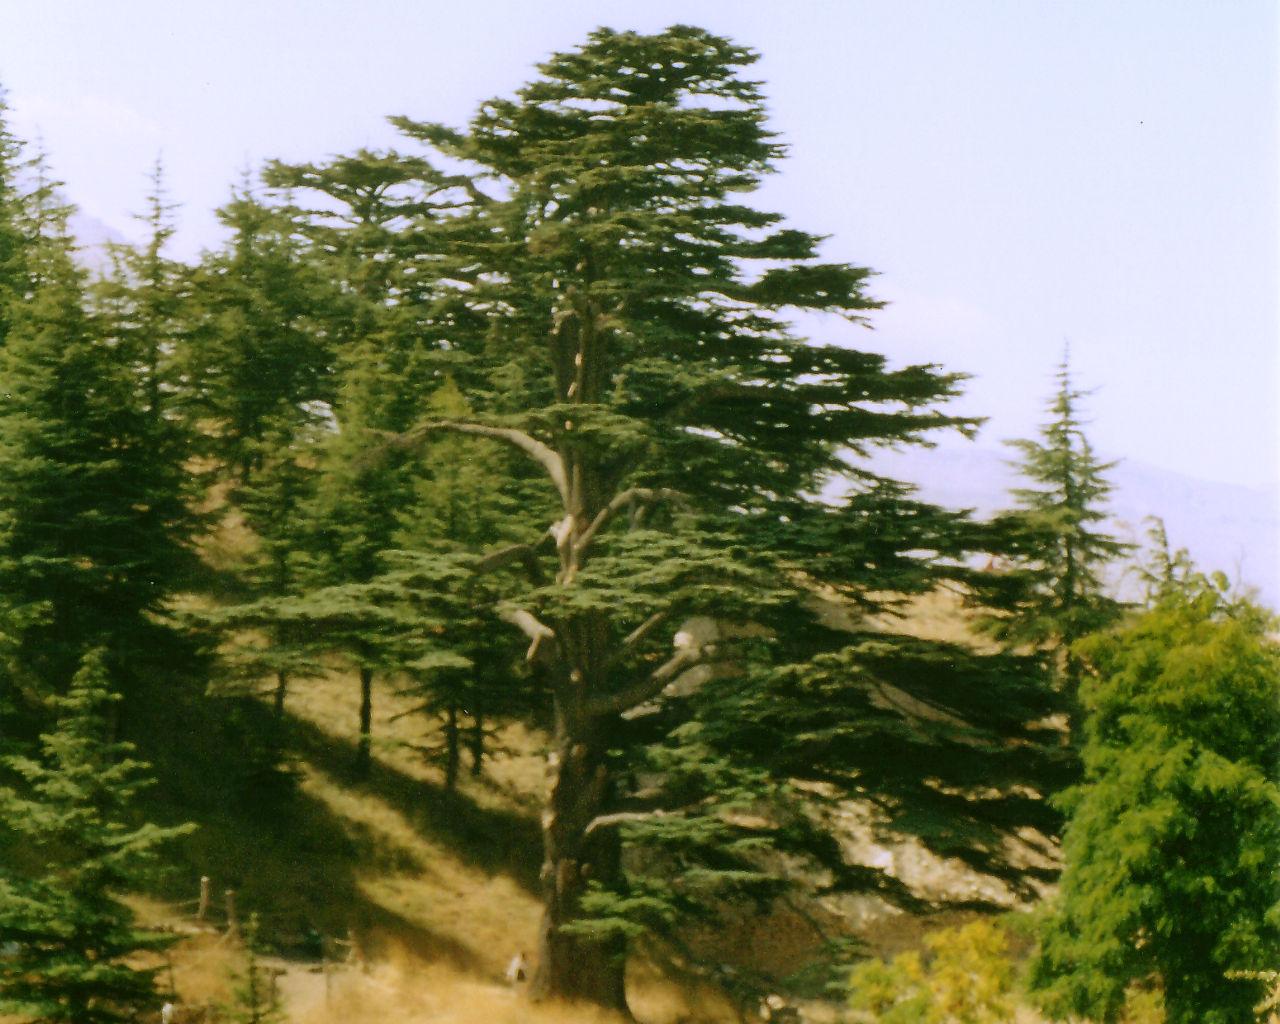 Cedar tree, Bcharré, Lebanon 2002